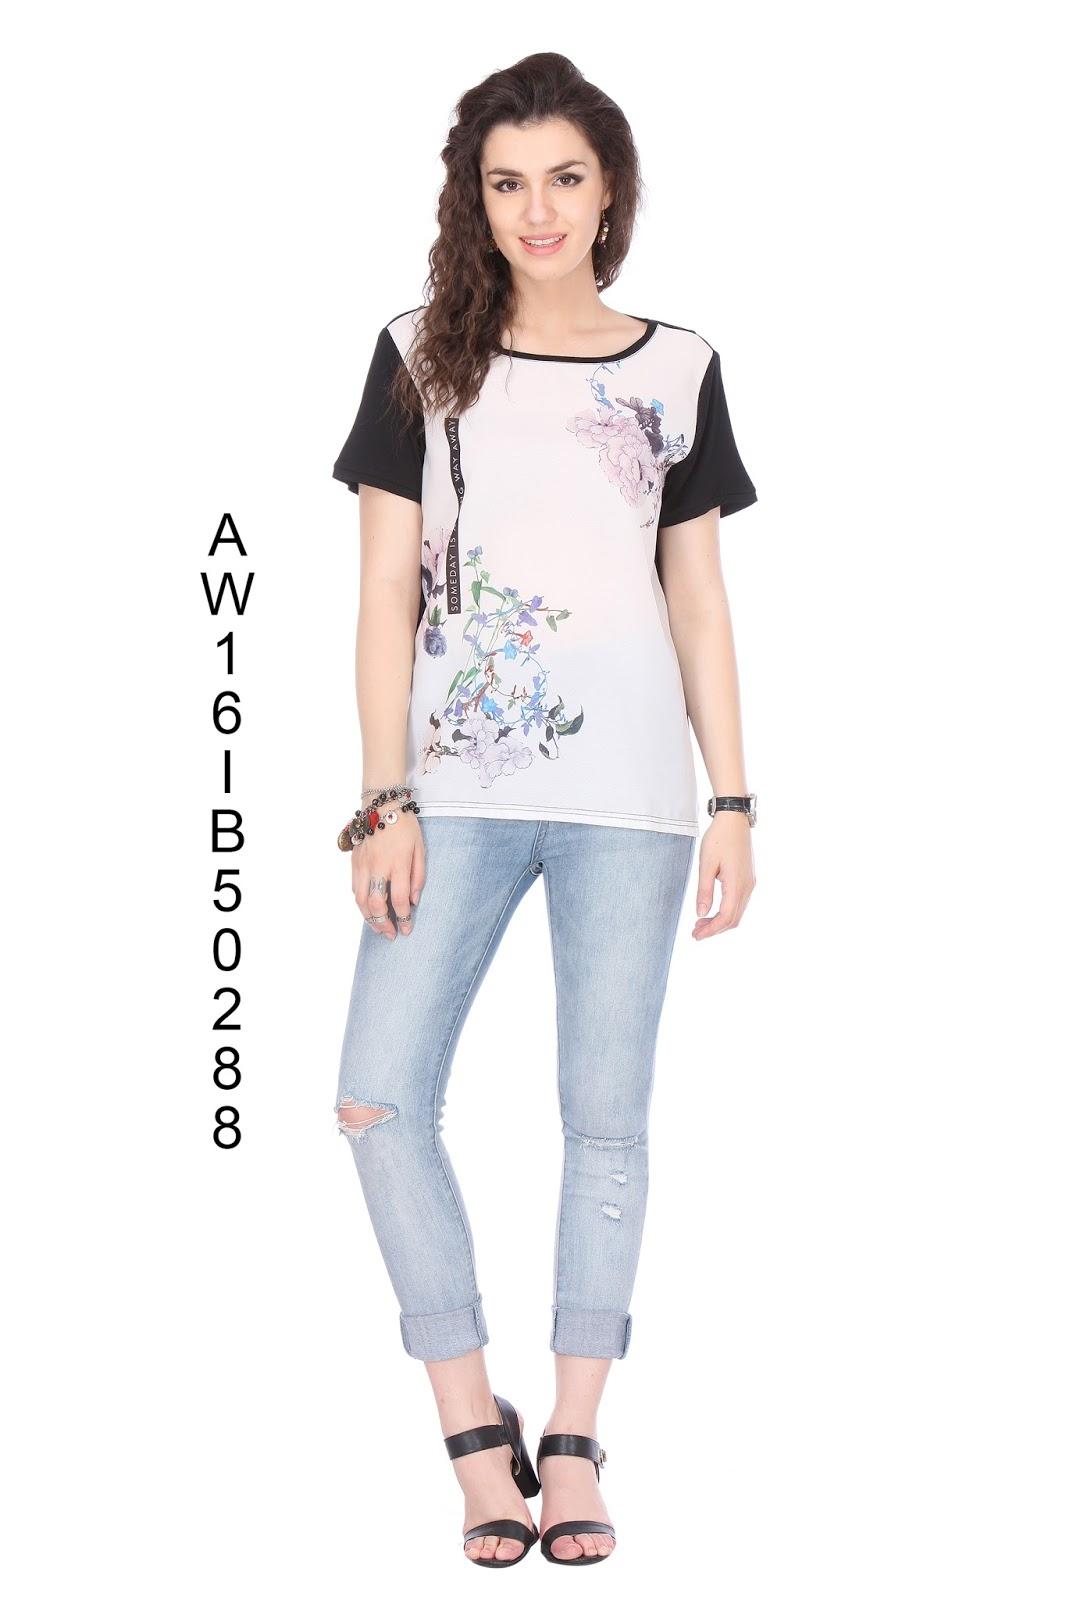 Tshirt Vol 1 – Viscose Collection Printed Tshirt Buy Online